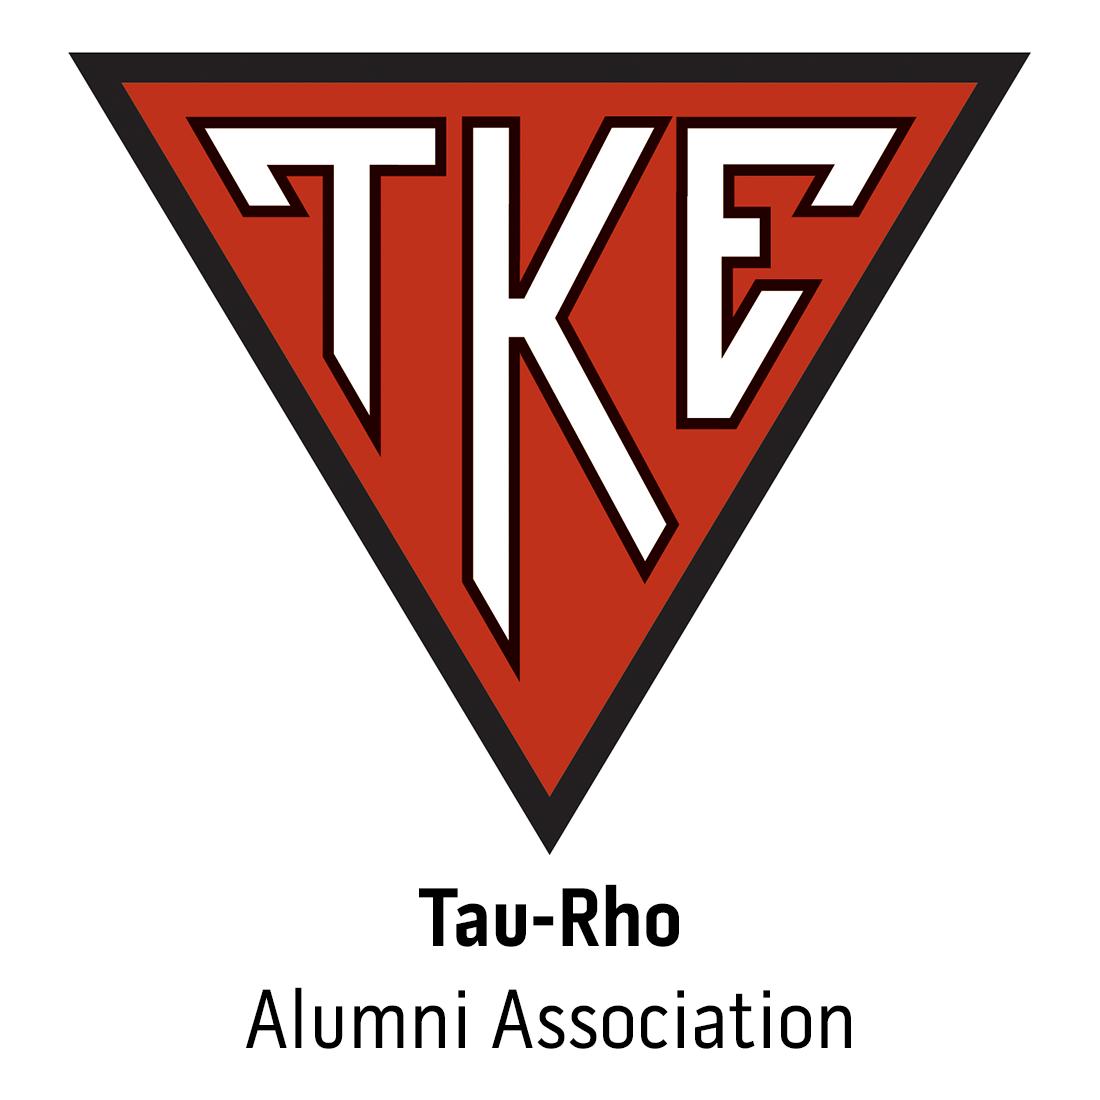 Tau-Rho Alumni Association for California State University, San Marcos